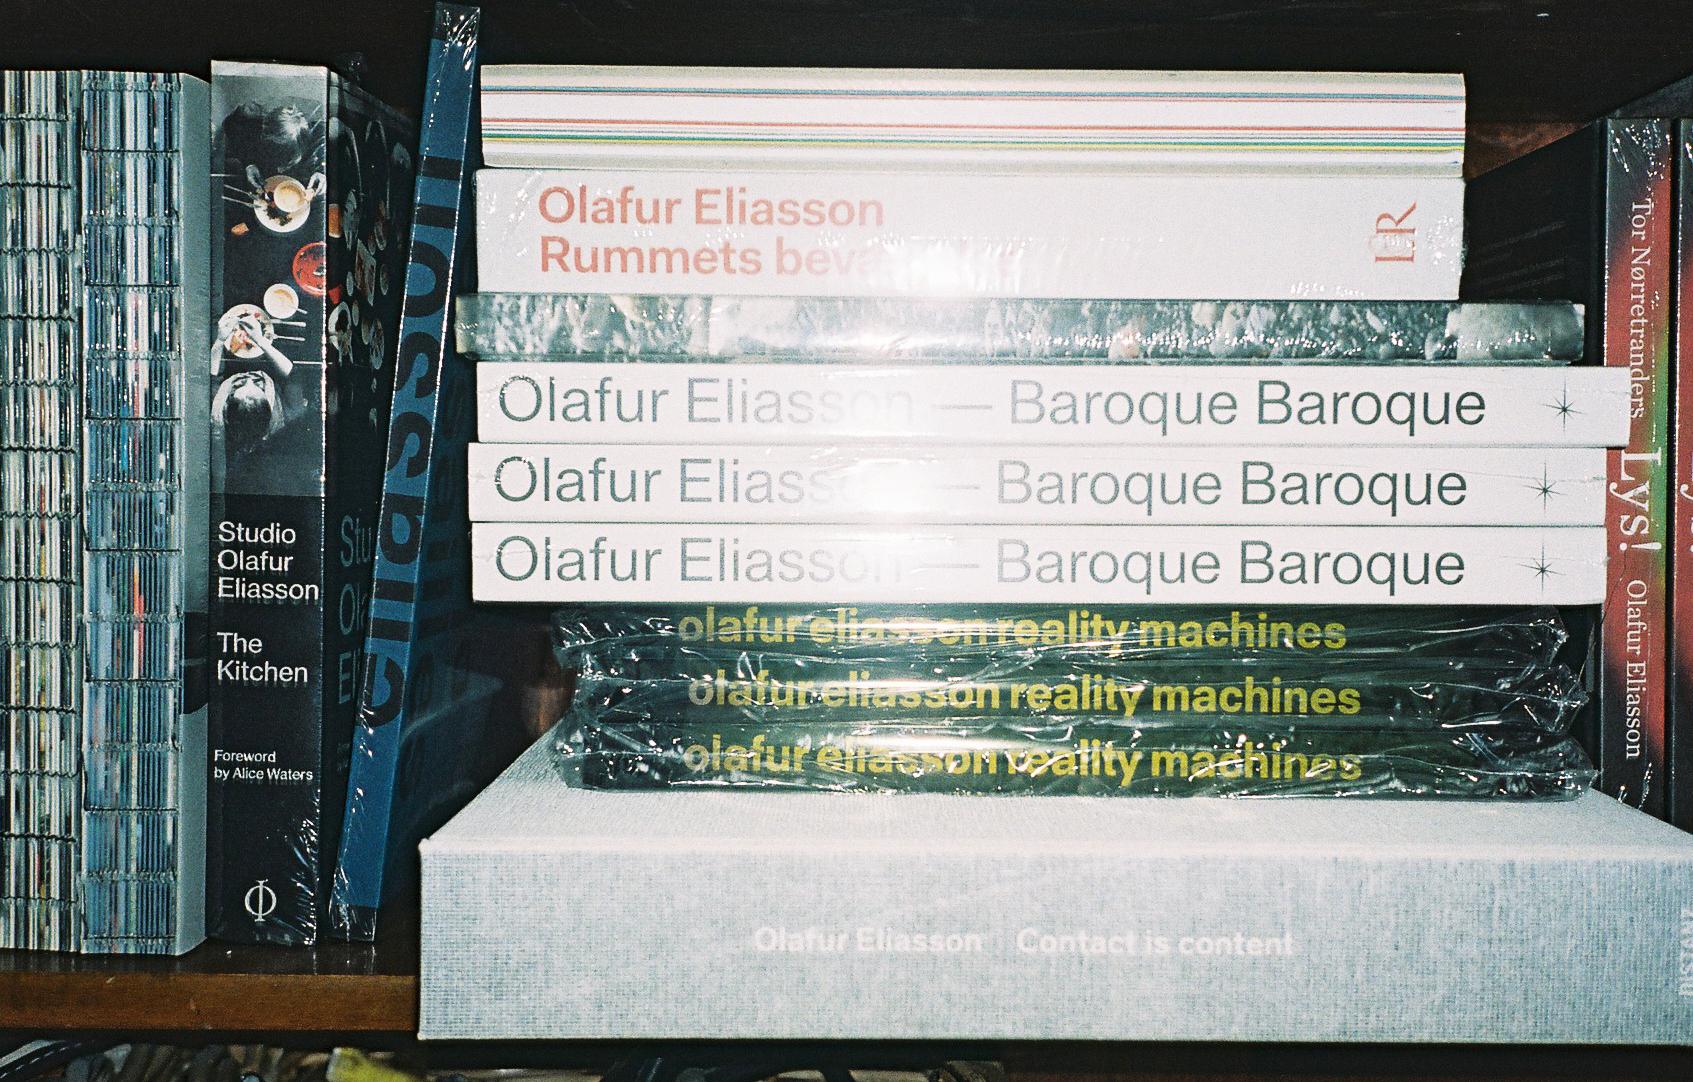 Olafur Eliason